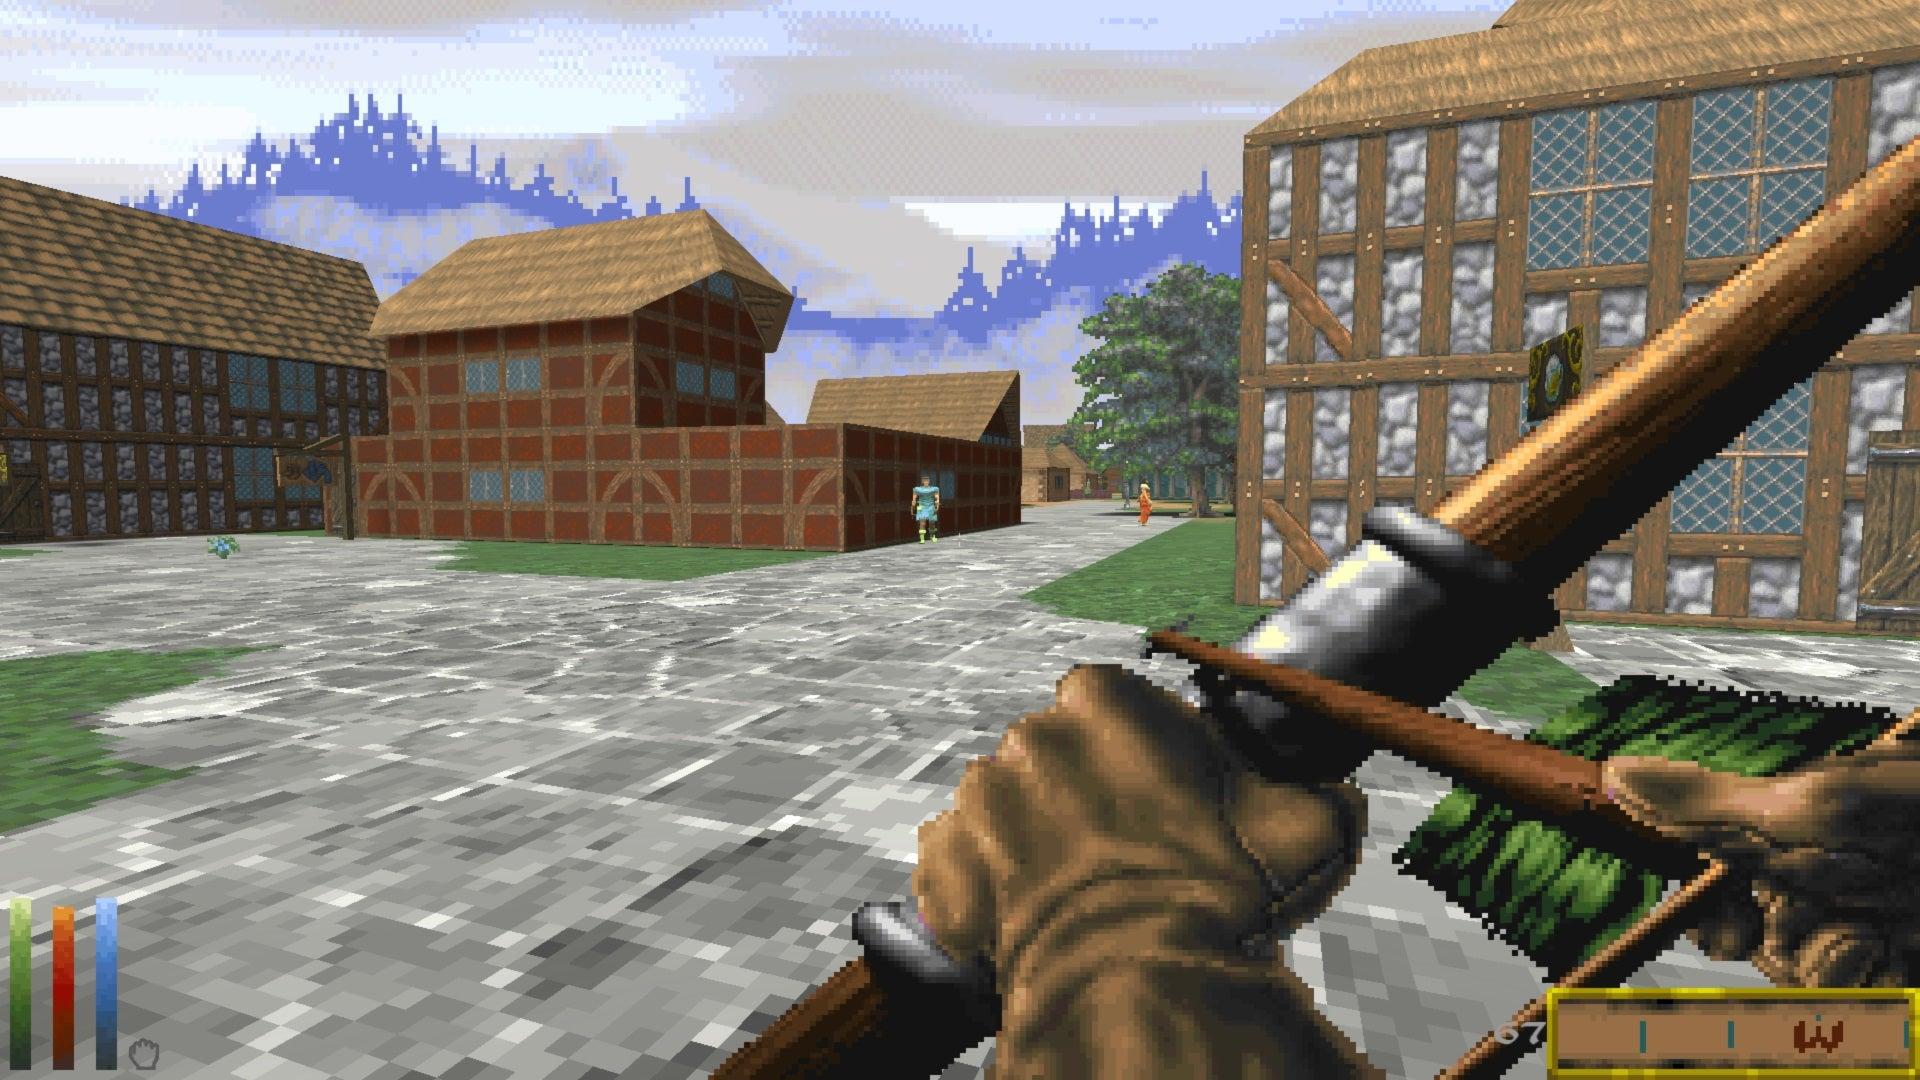 The Biggest Elder Scrolls Game Has Been Remade In Unity